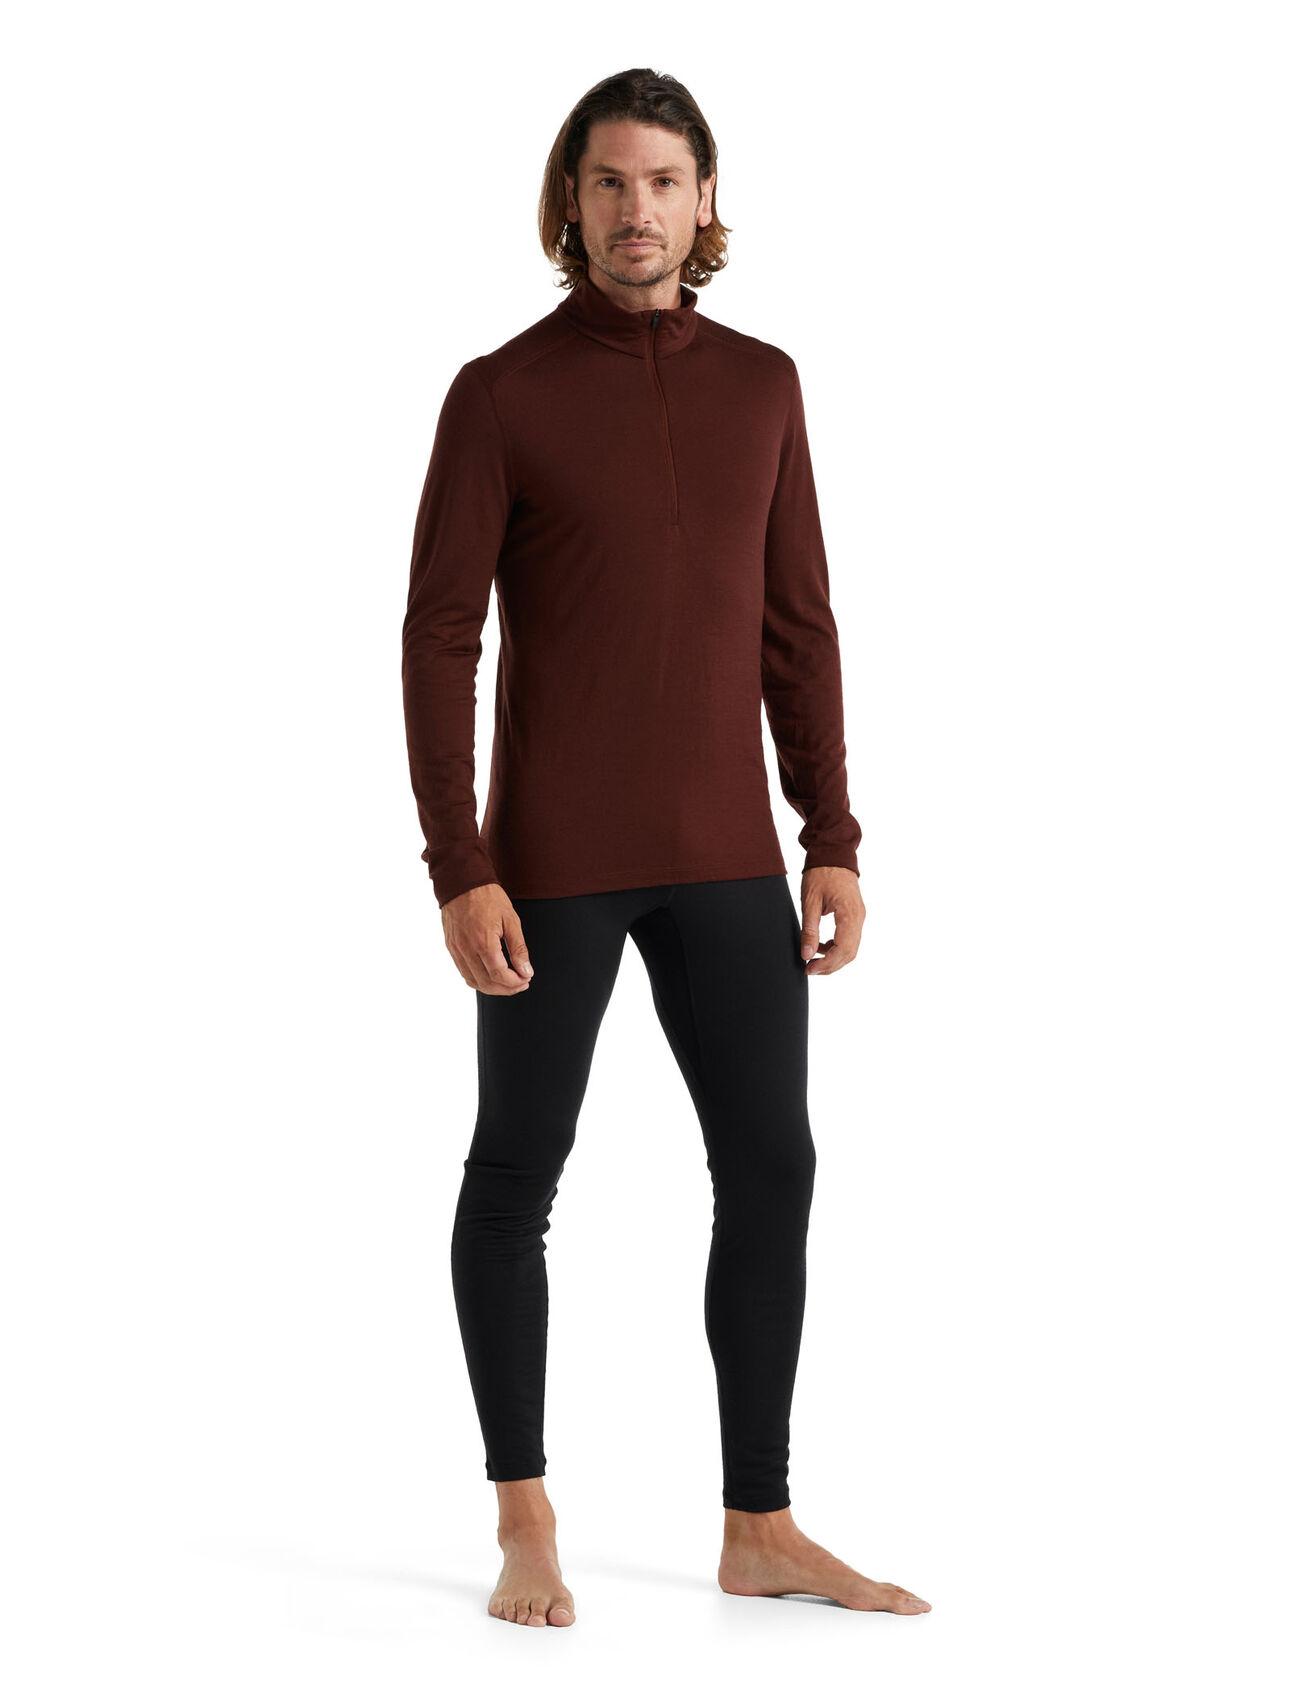 Men's 200 Oasis Half Zip & Leggings